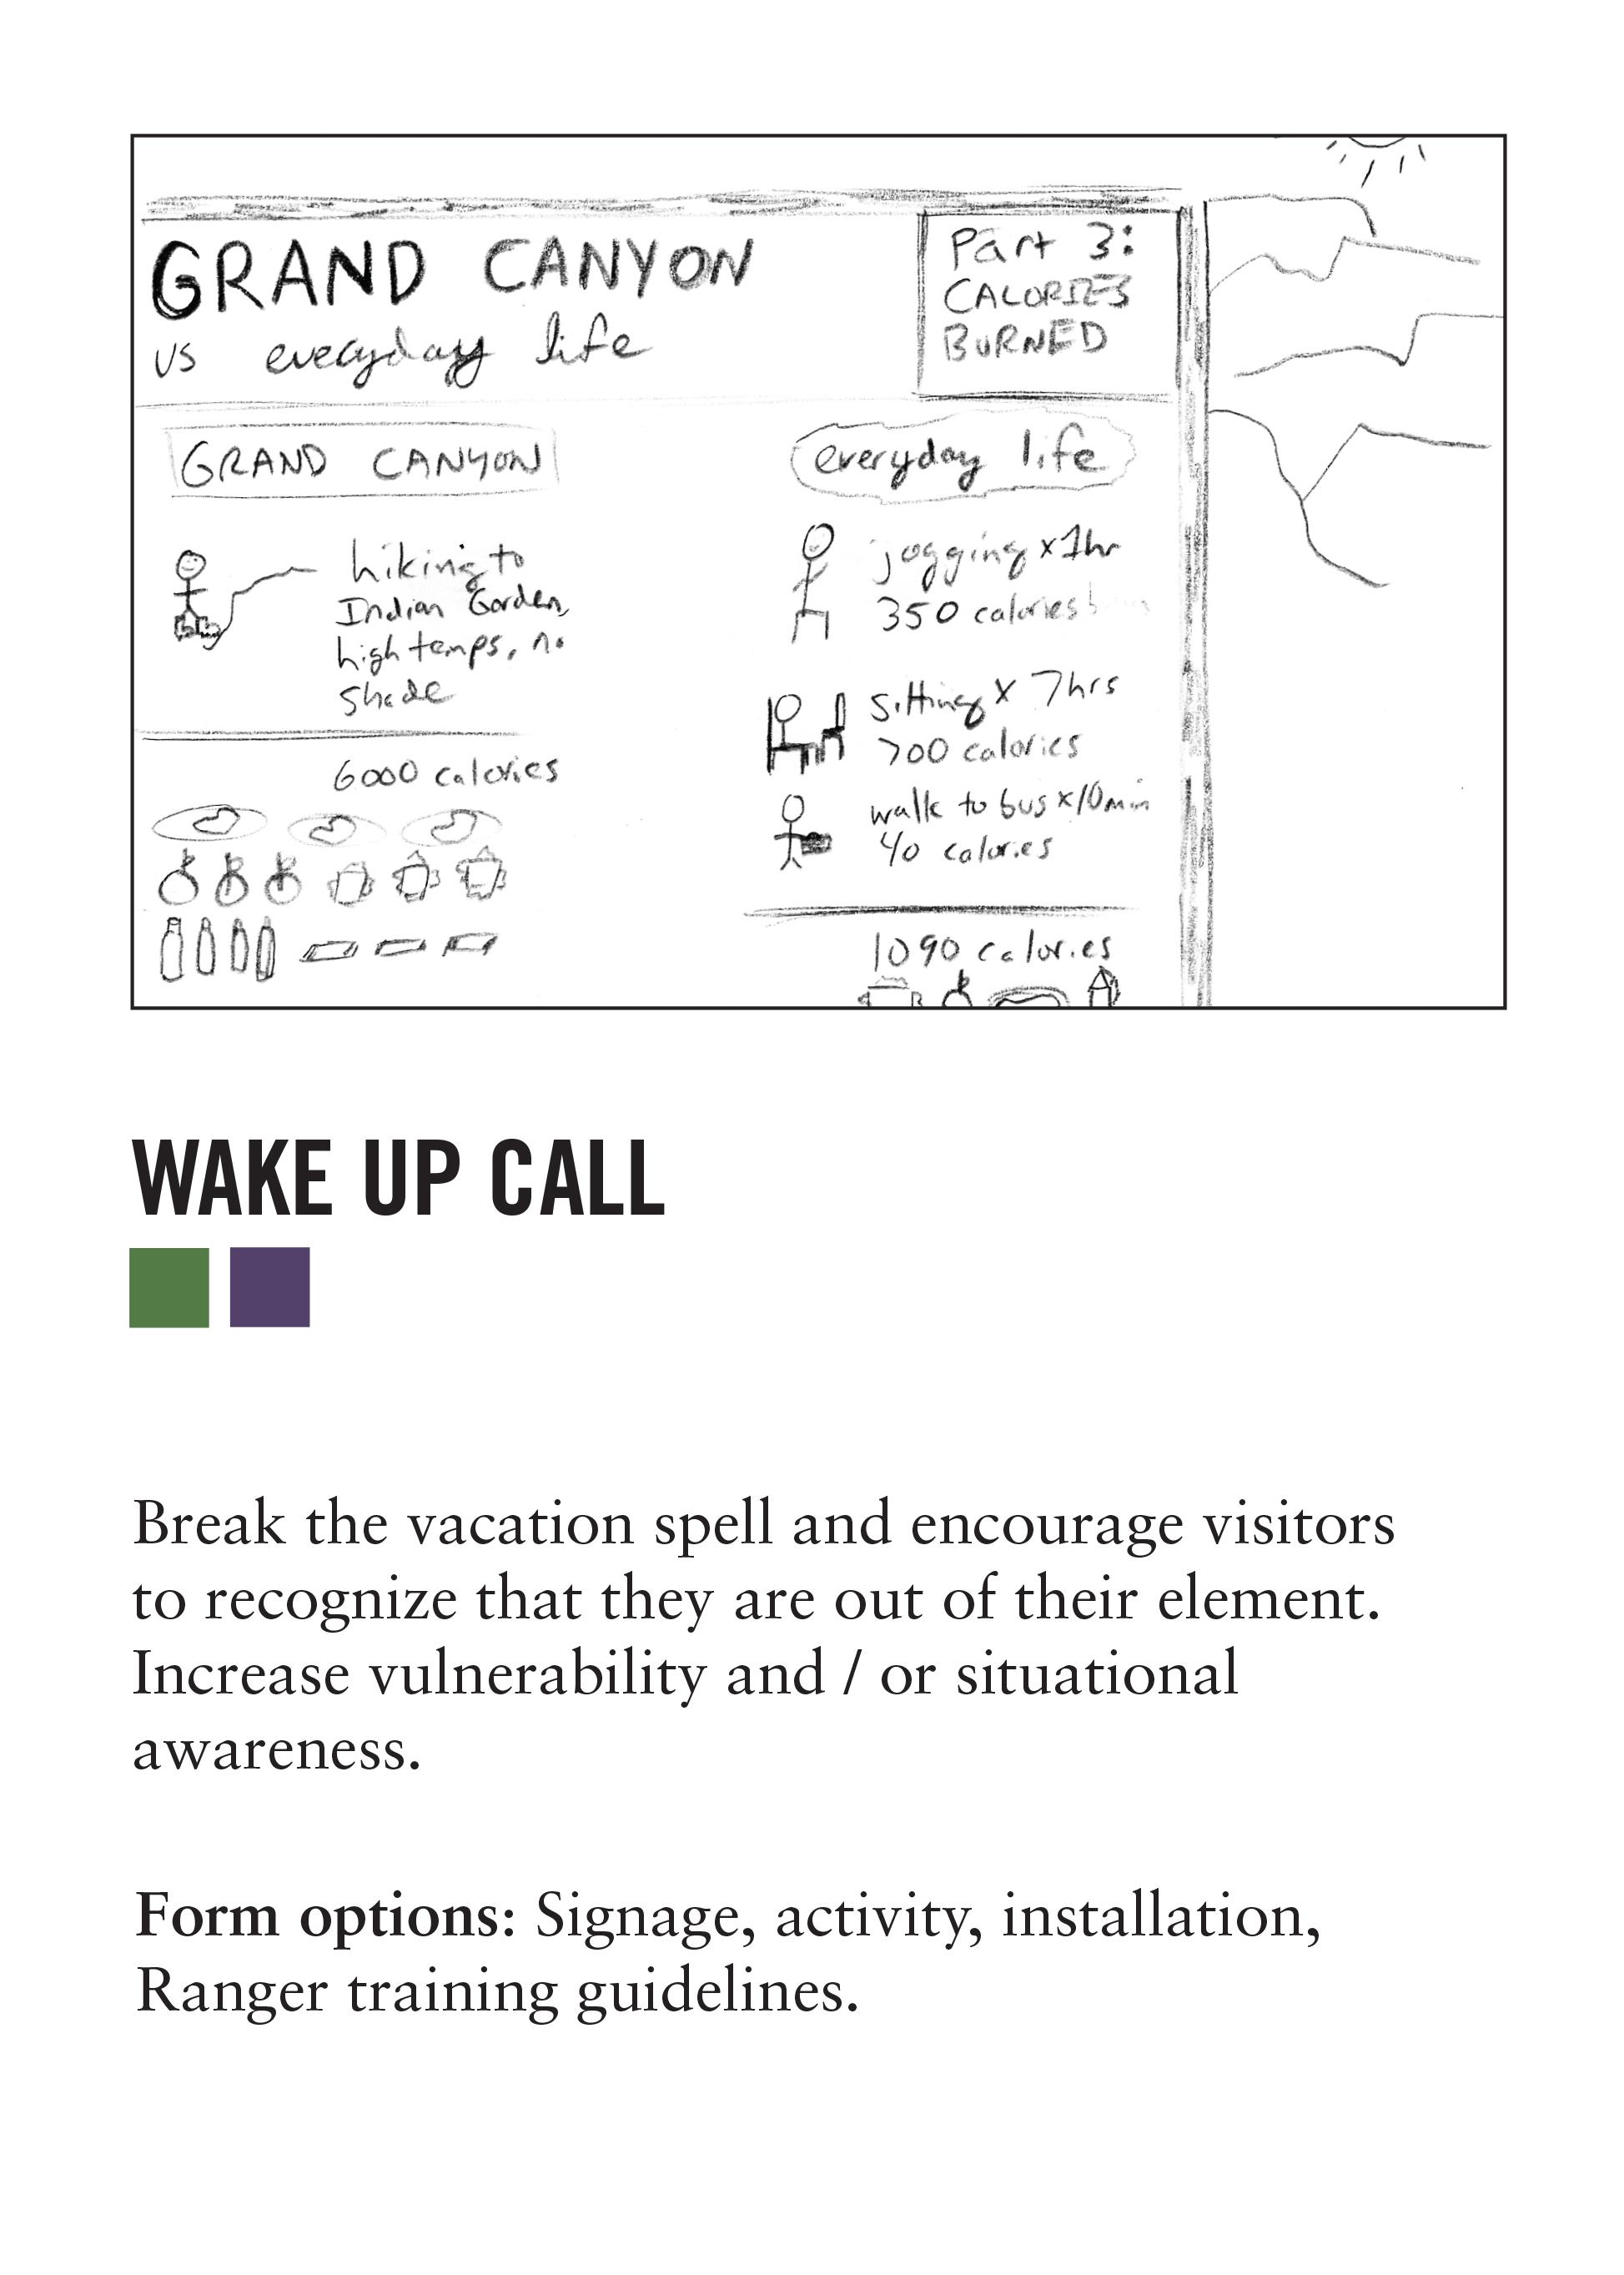 poster-wakeupcall.jpg